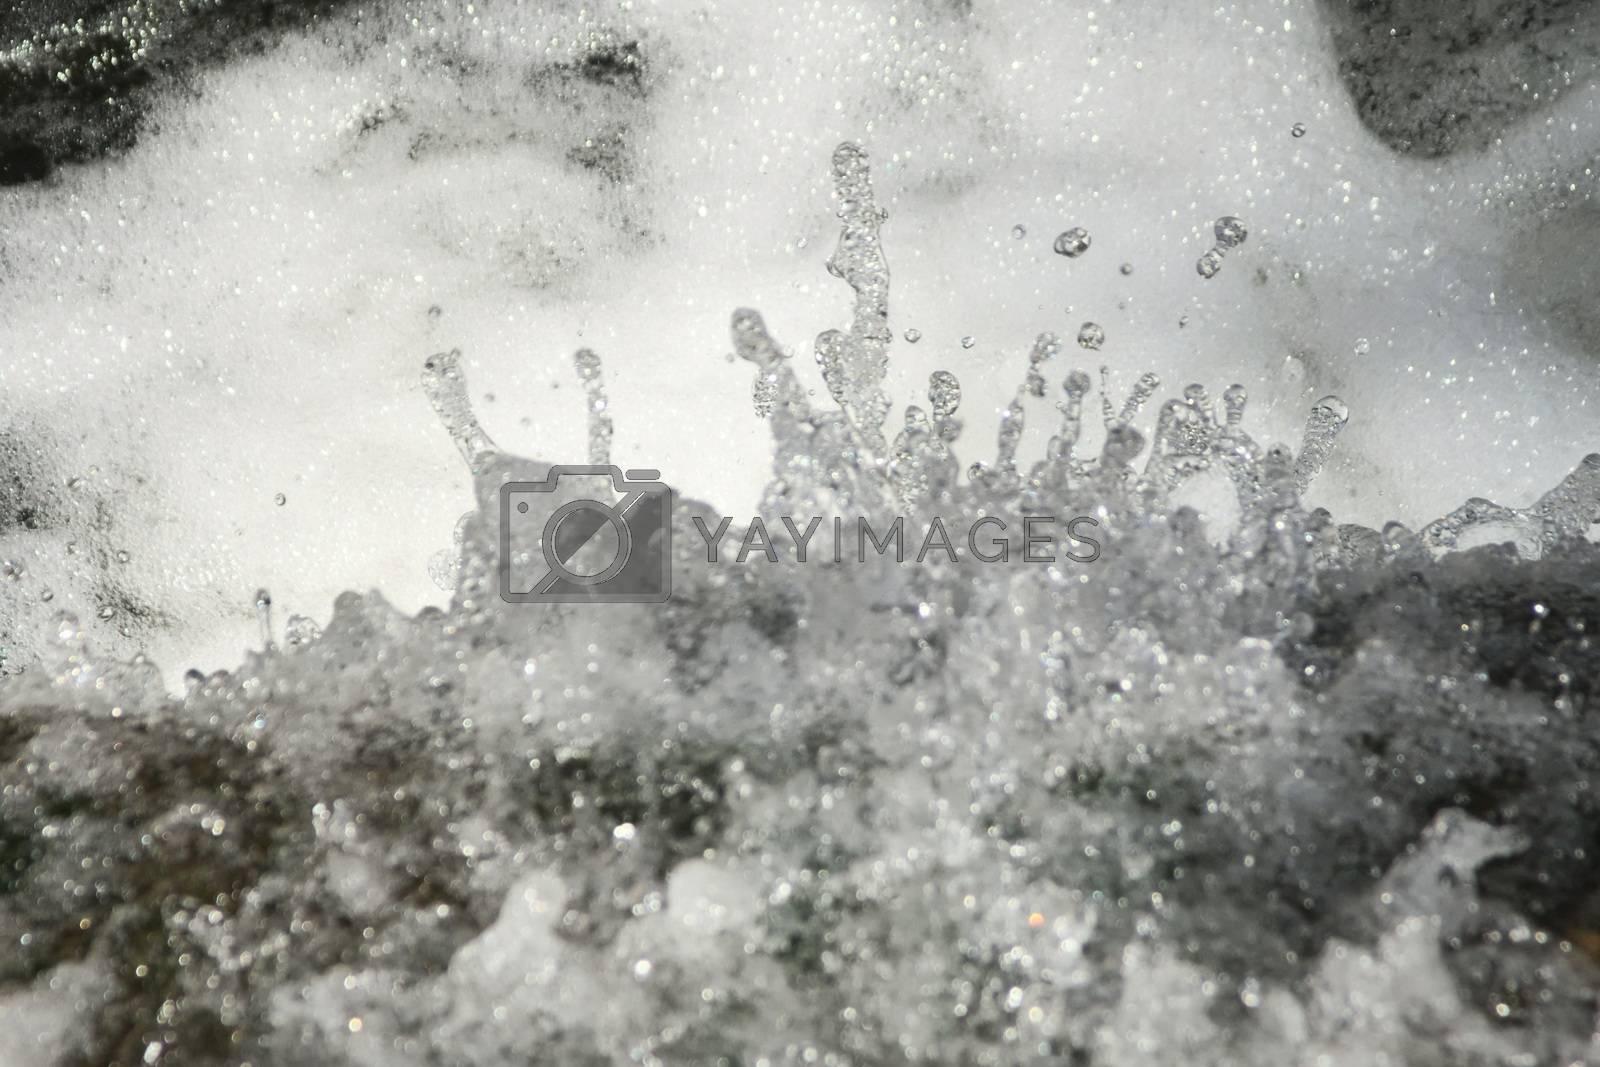 Royalty free image of Clear, fresh water splattering in a creek by hernan_hyper